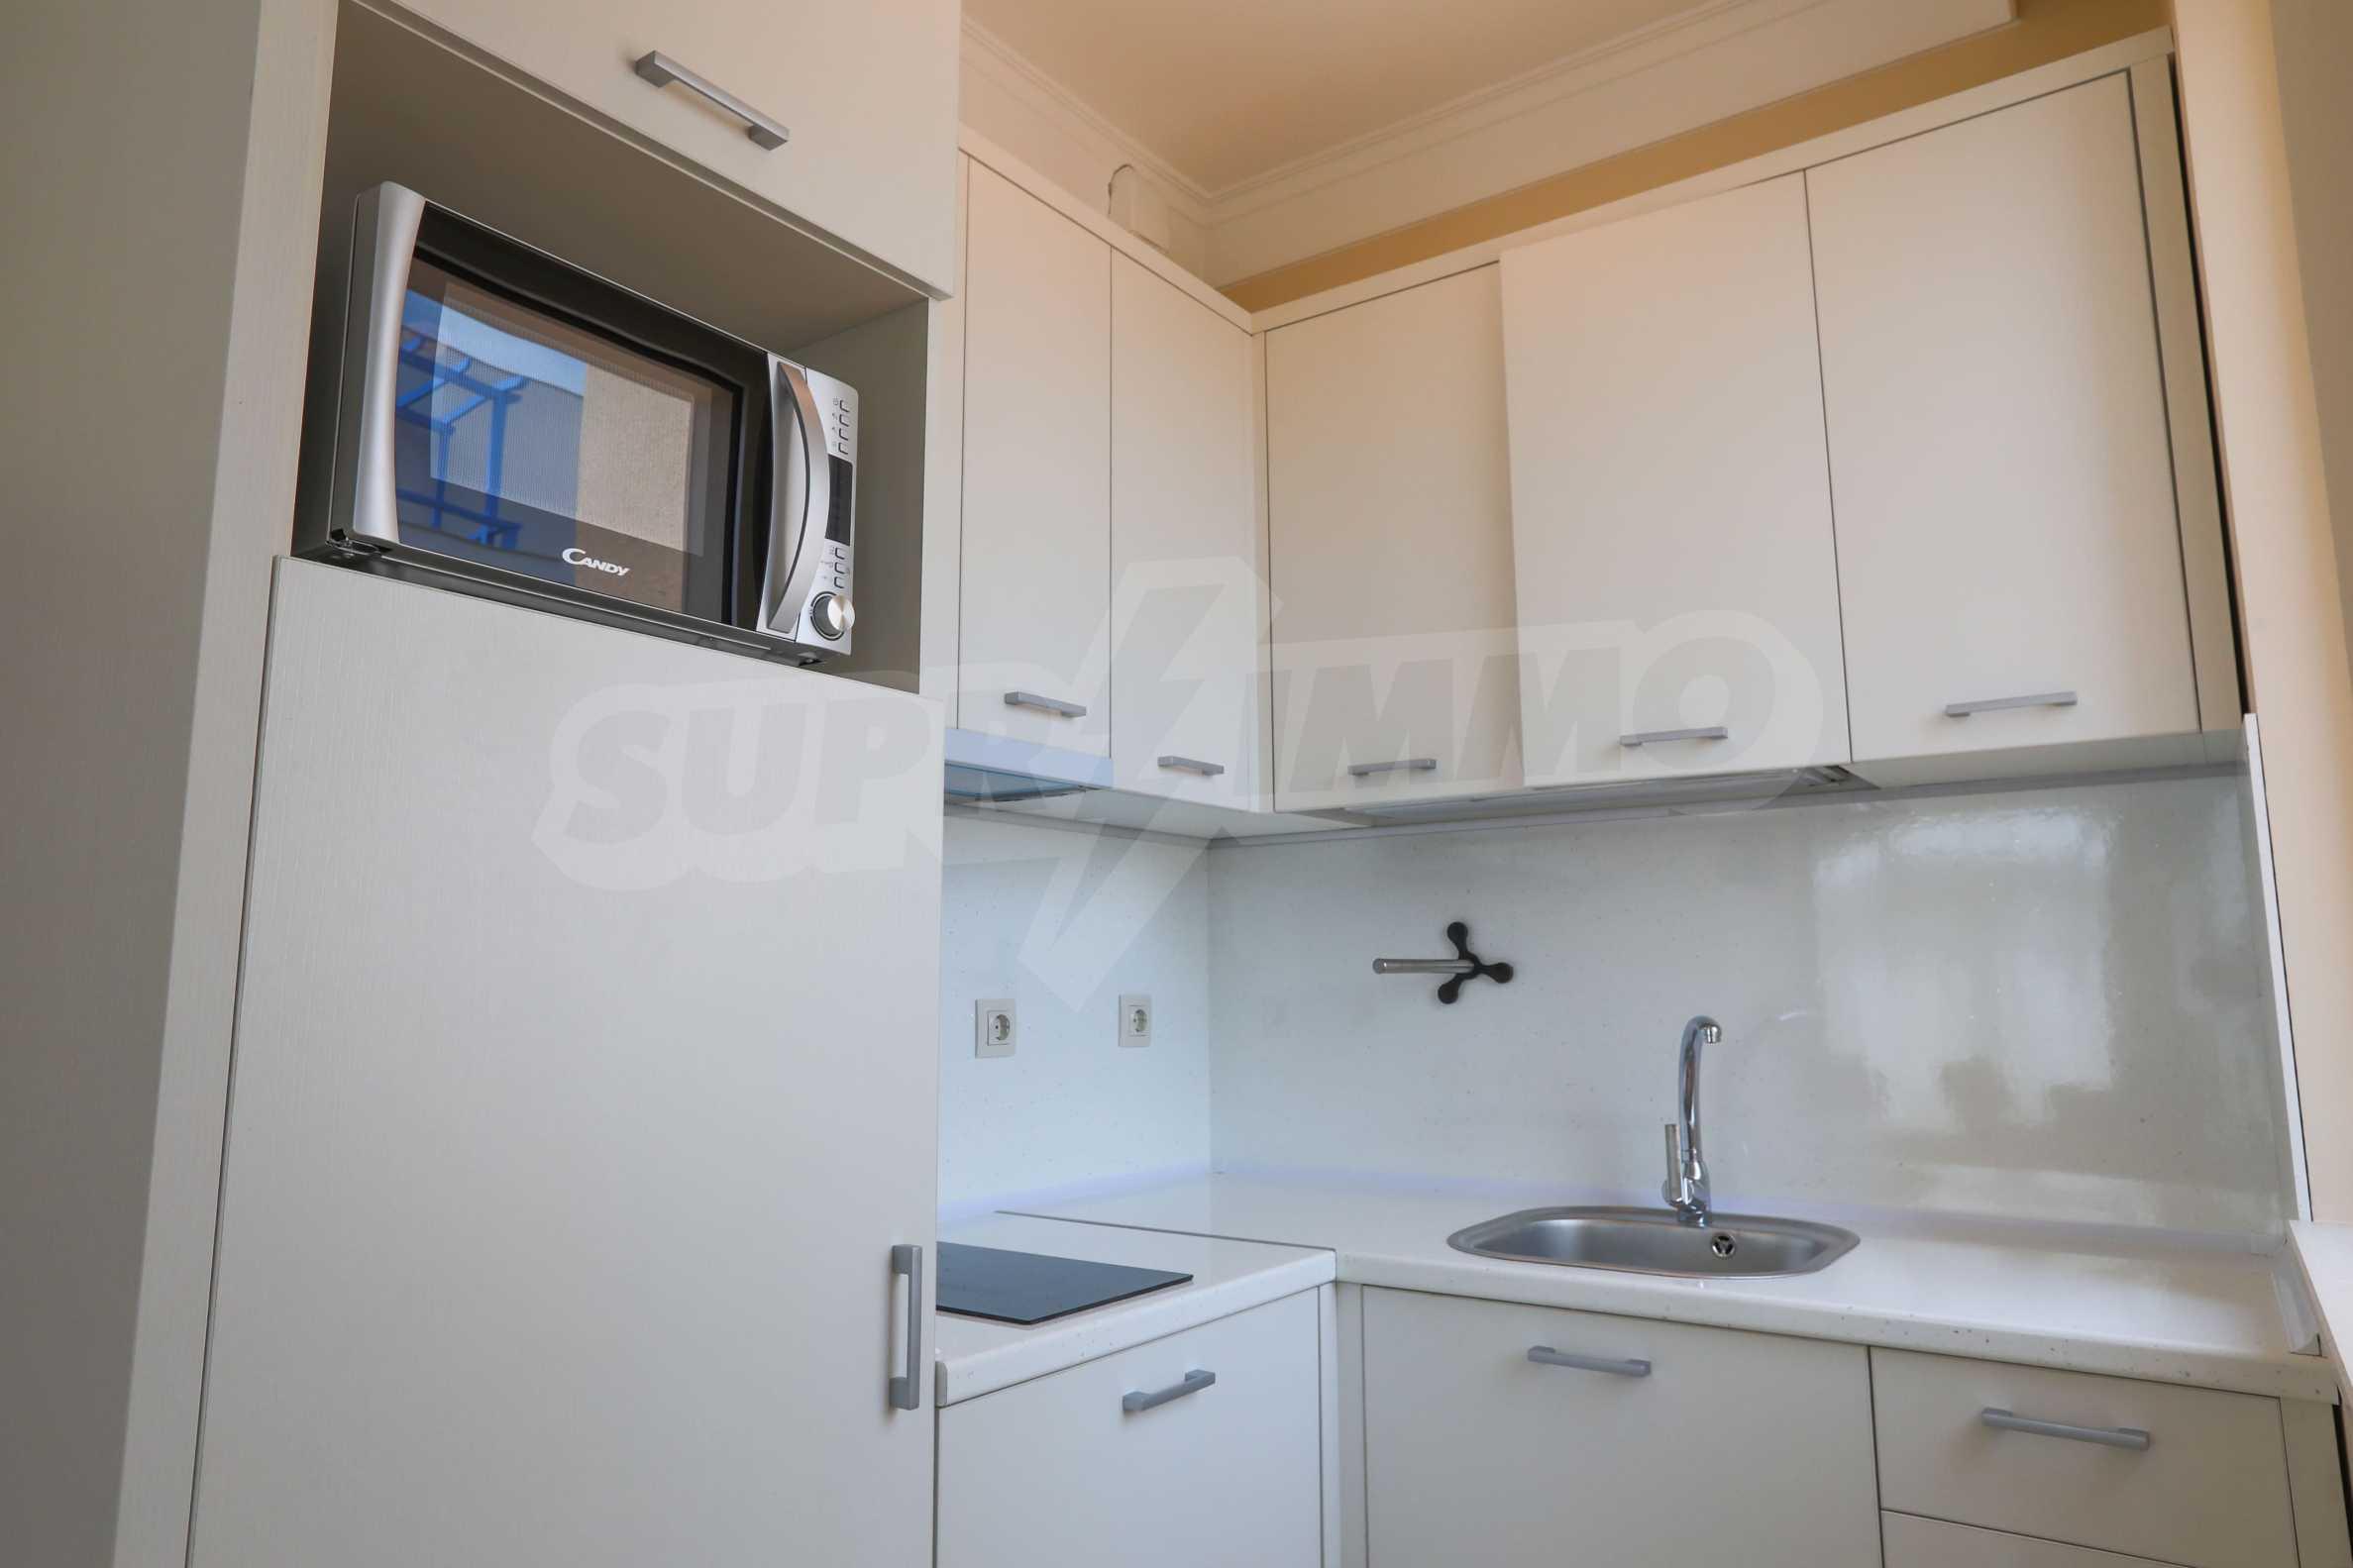 Комфортен двустаен апартамент под наем в Belle Époque Beach Residence, курорт Лозенец 7